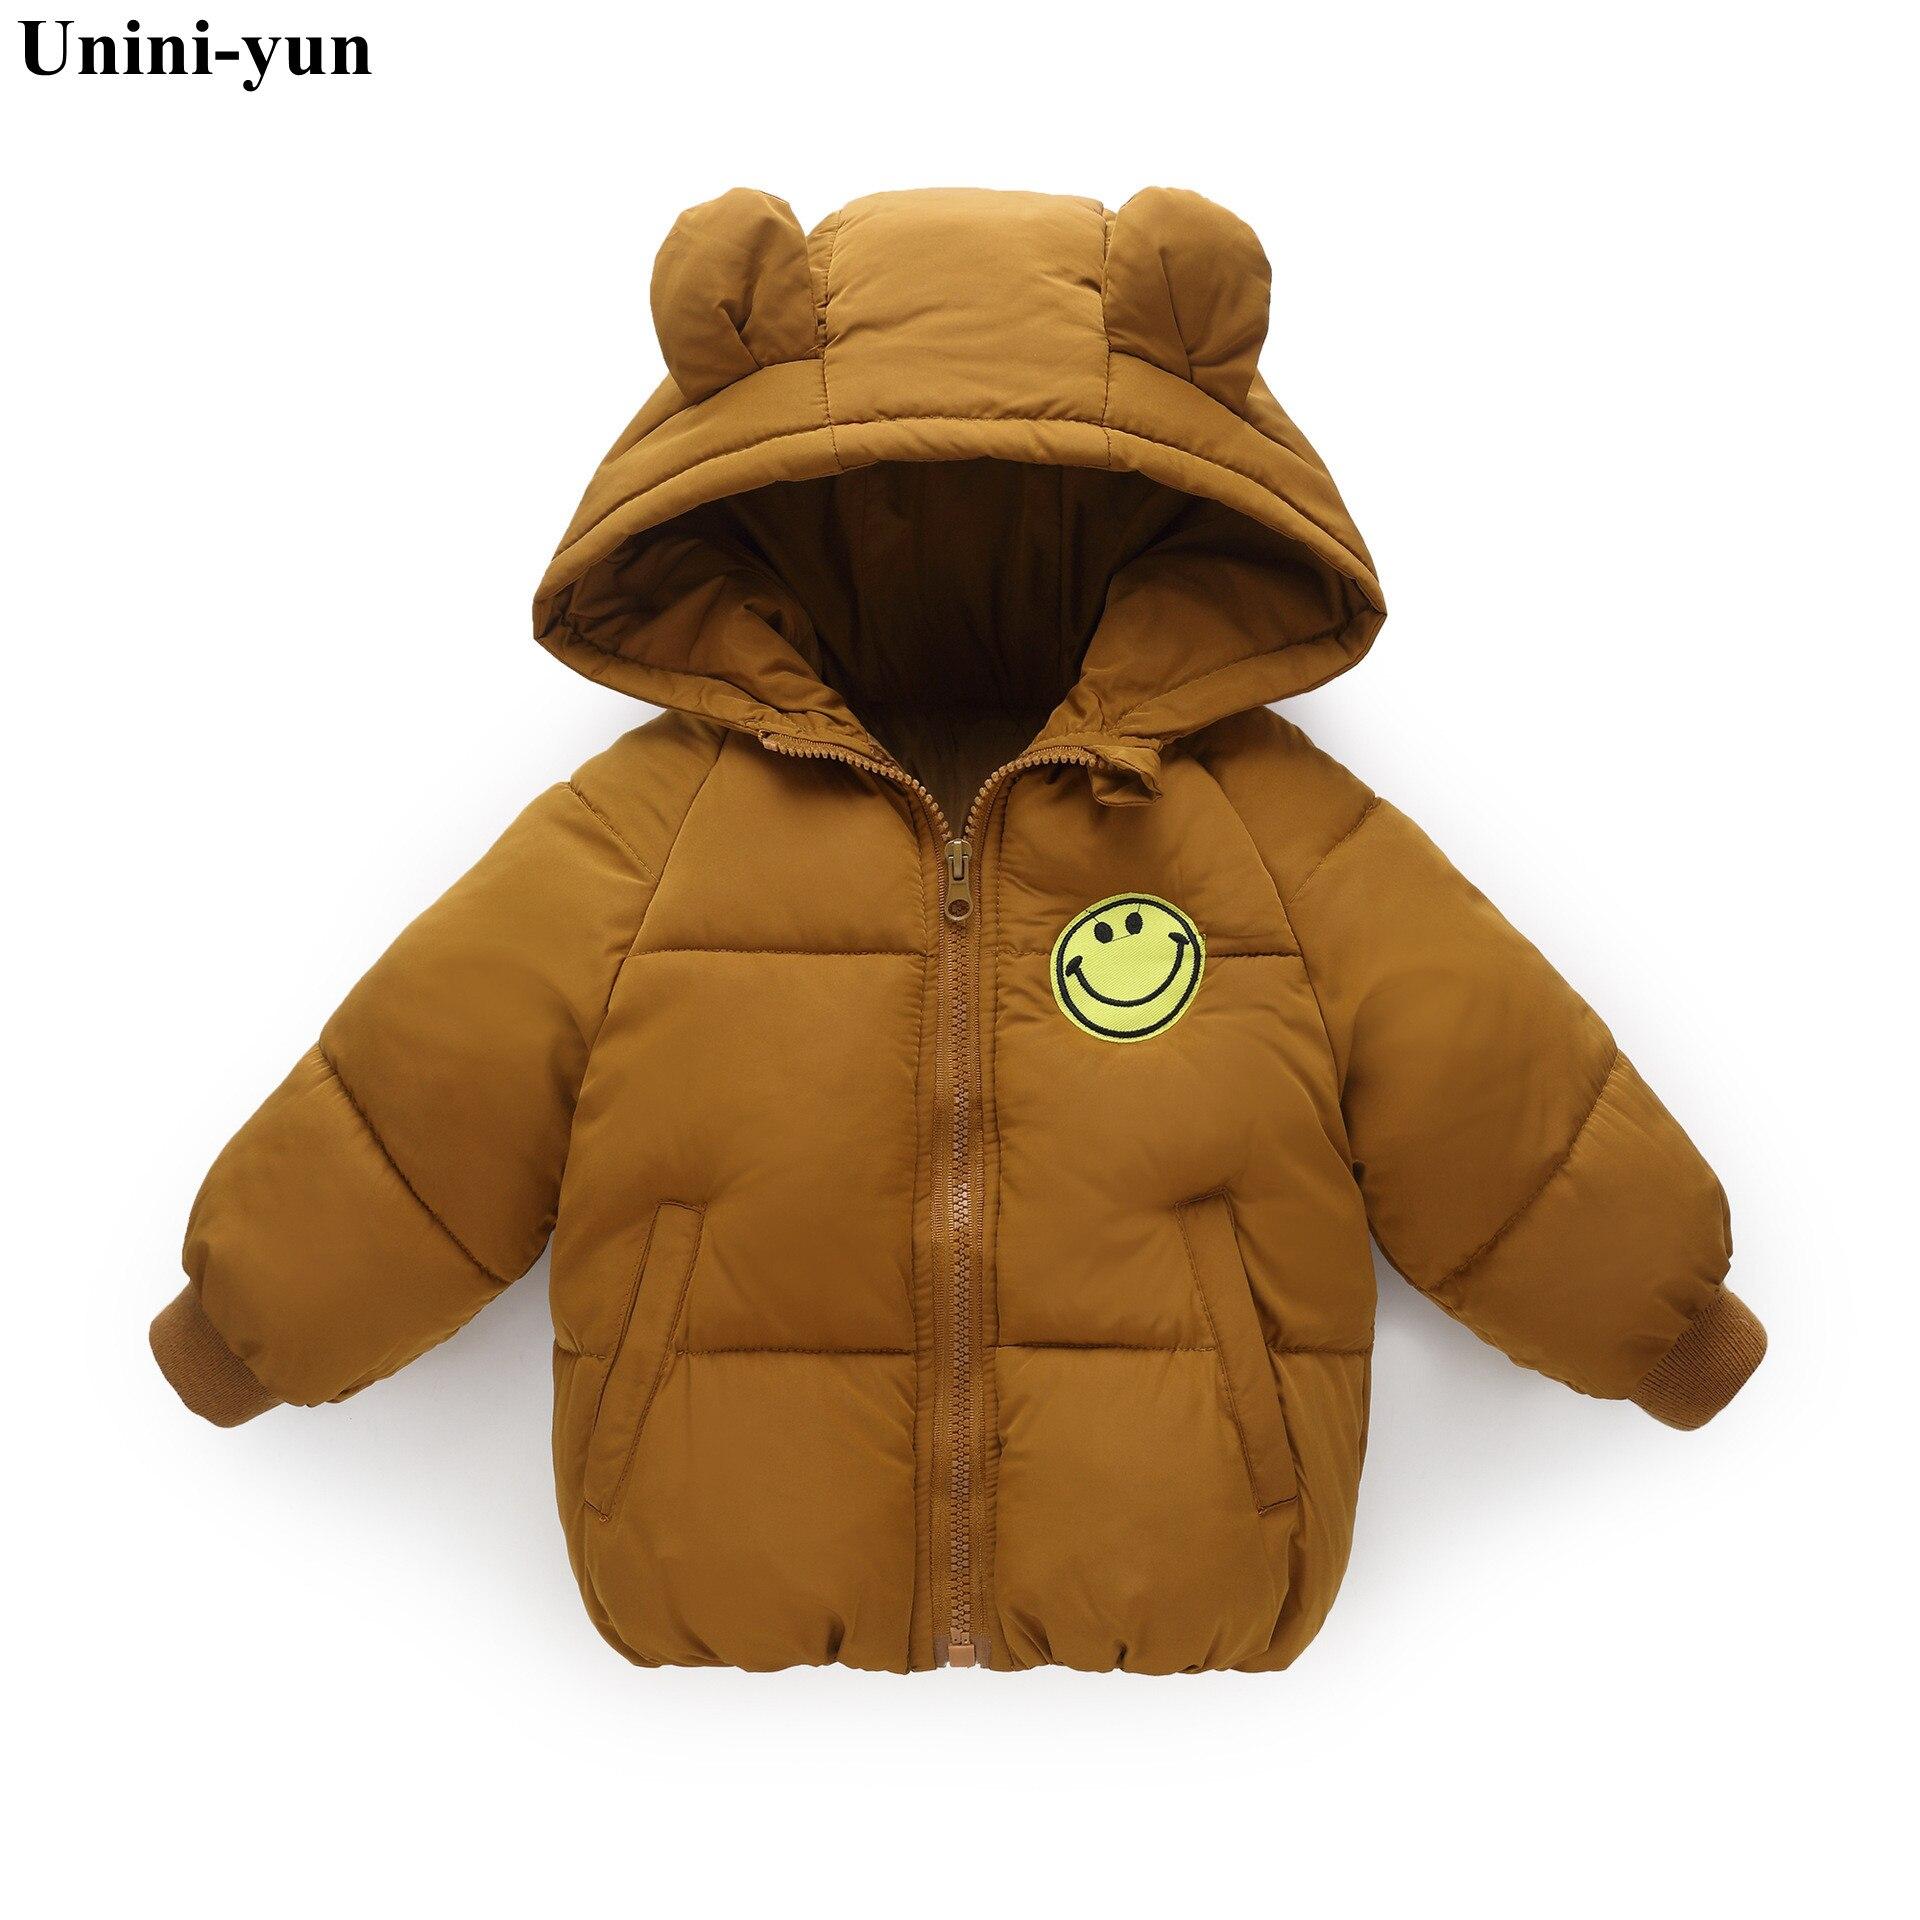 0b951b636a67 Dropwow Children Jackets Boys Girls Winter Down Coat 2018 Baby ...